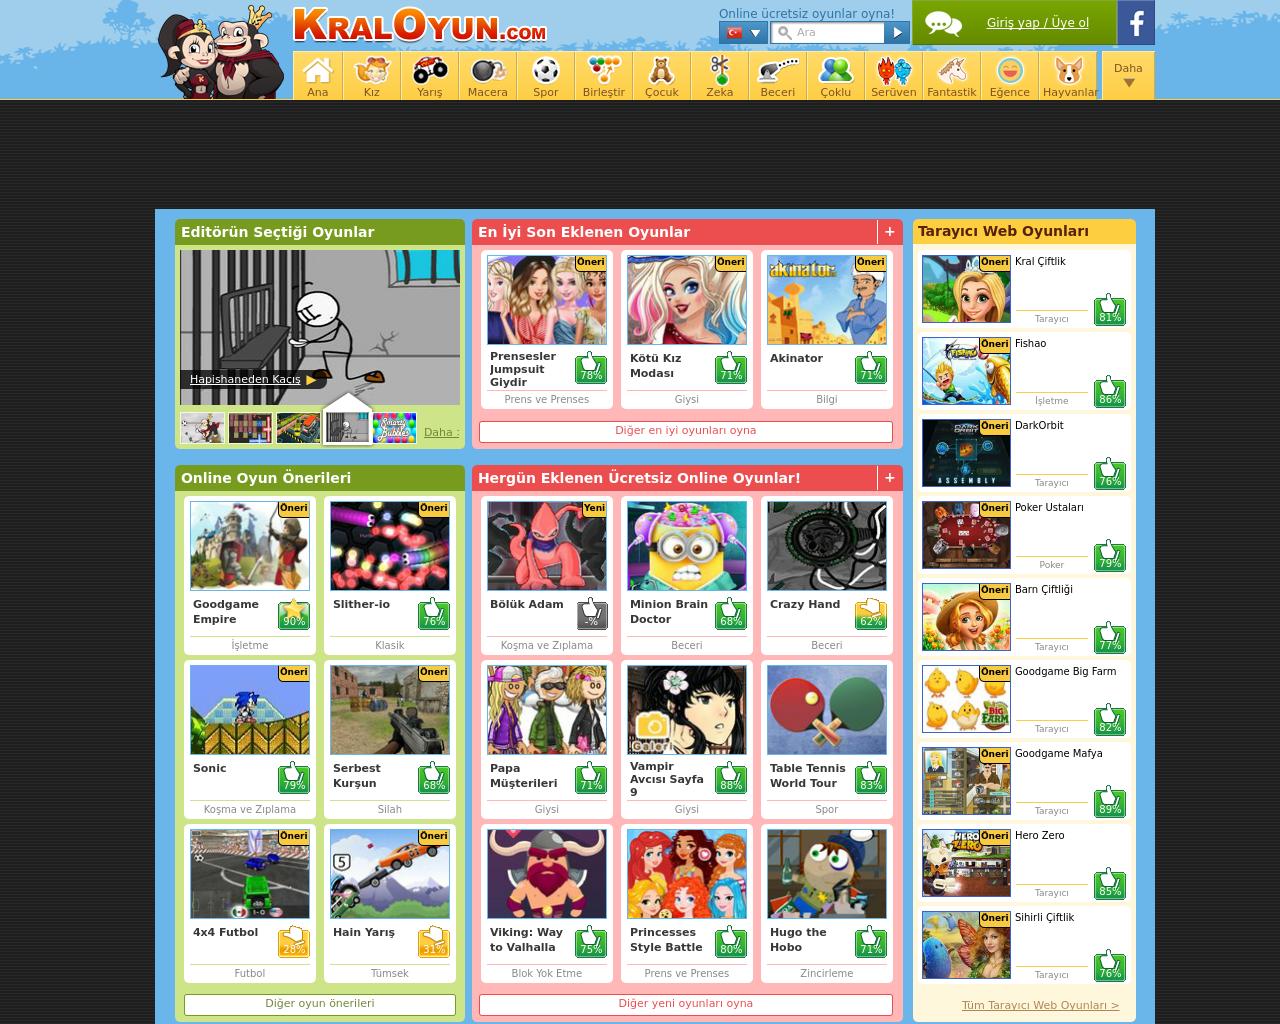 Kraloyuncom Advertising Mediakits Reviews Pricing Traffic Rate